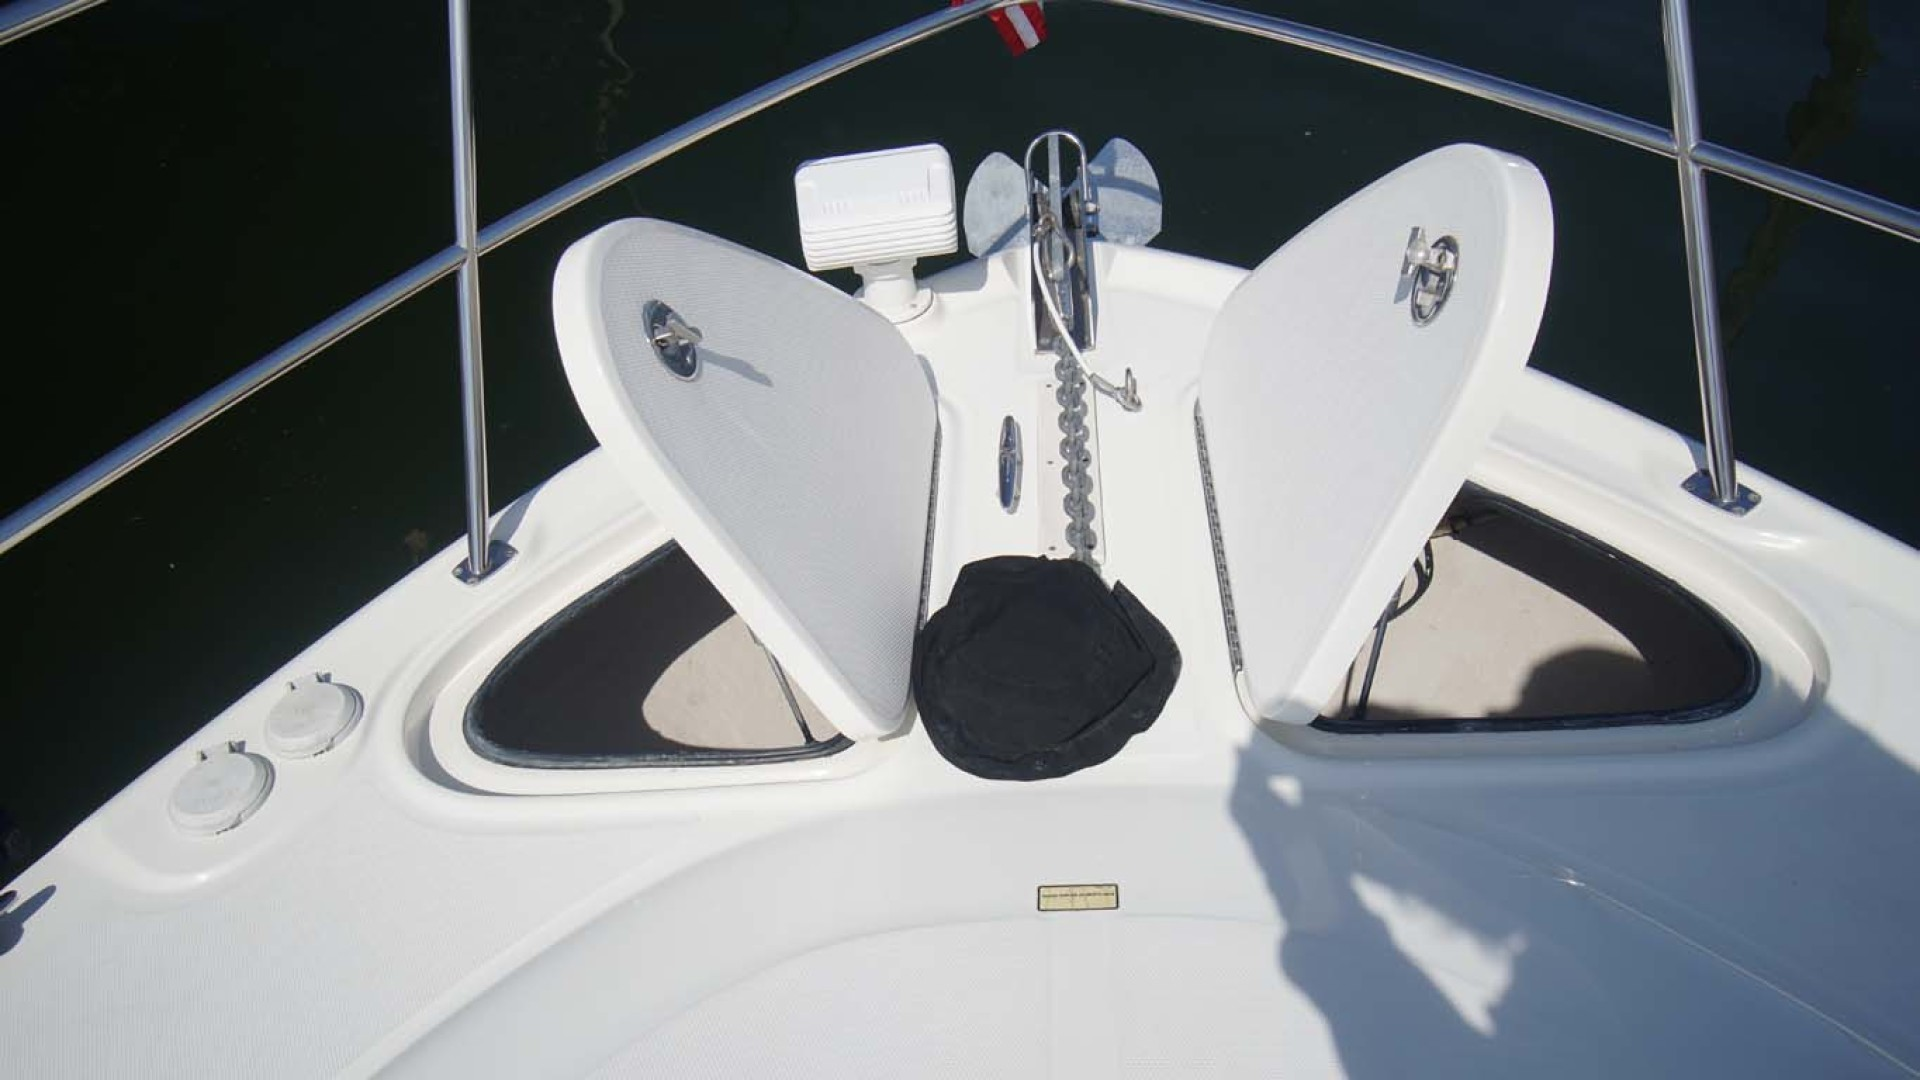 Sea Ray-Sundancer 2006-Late Fee Destin-Florida-United States-Spotlight, Windlass, Anchor Lockers with Washdown-1125973 | Thumbnail